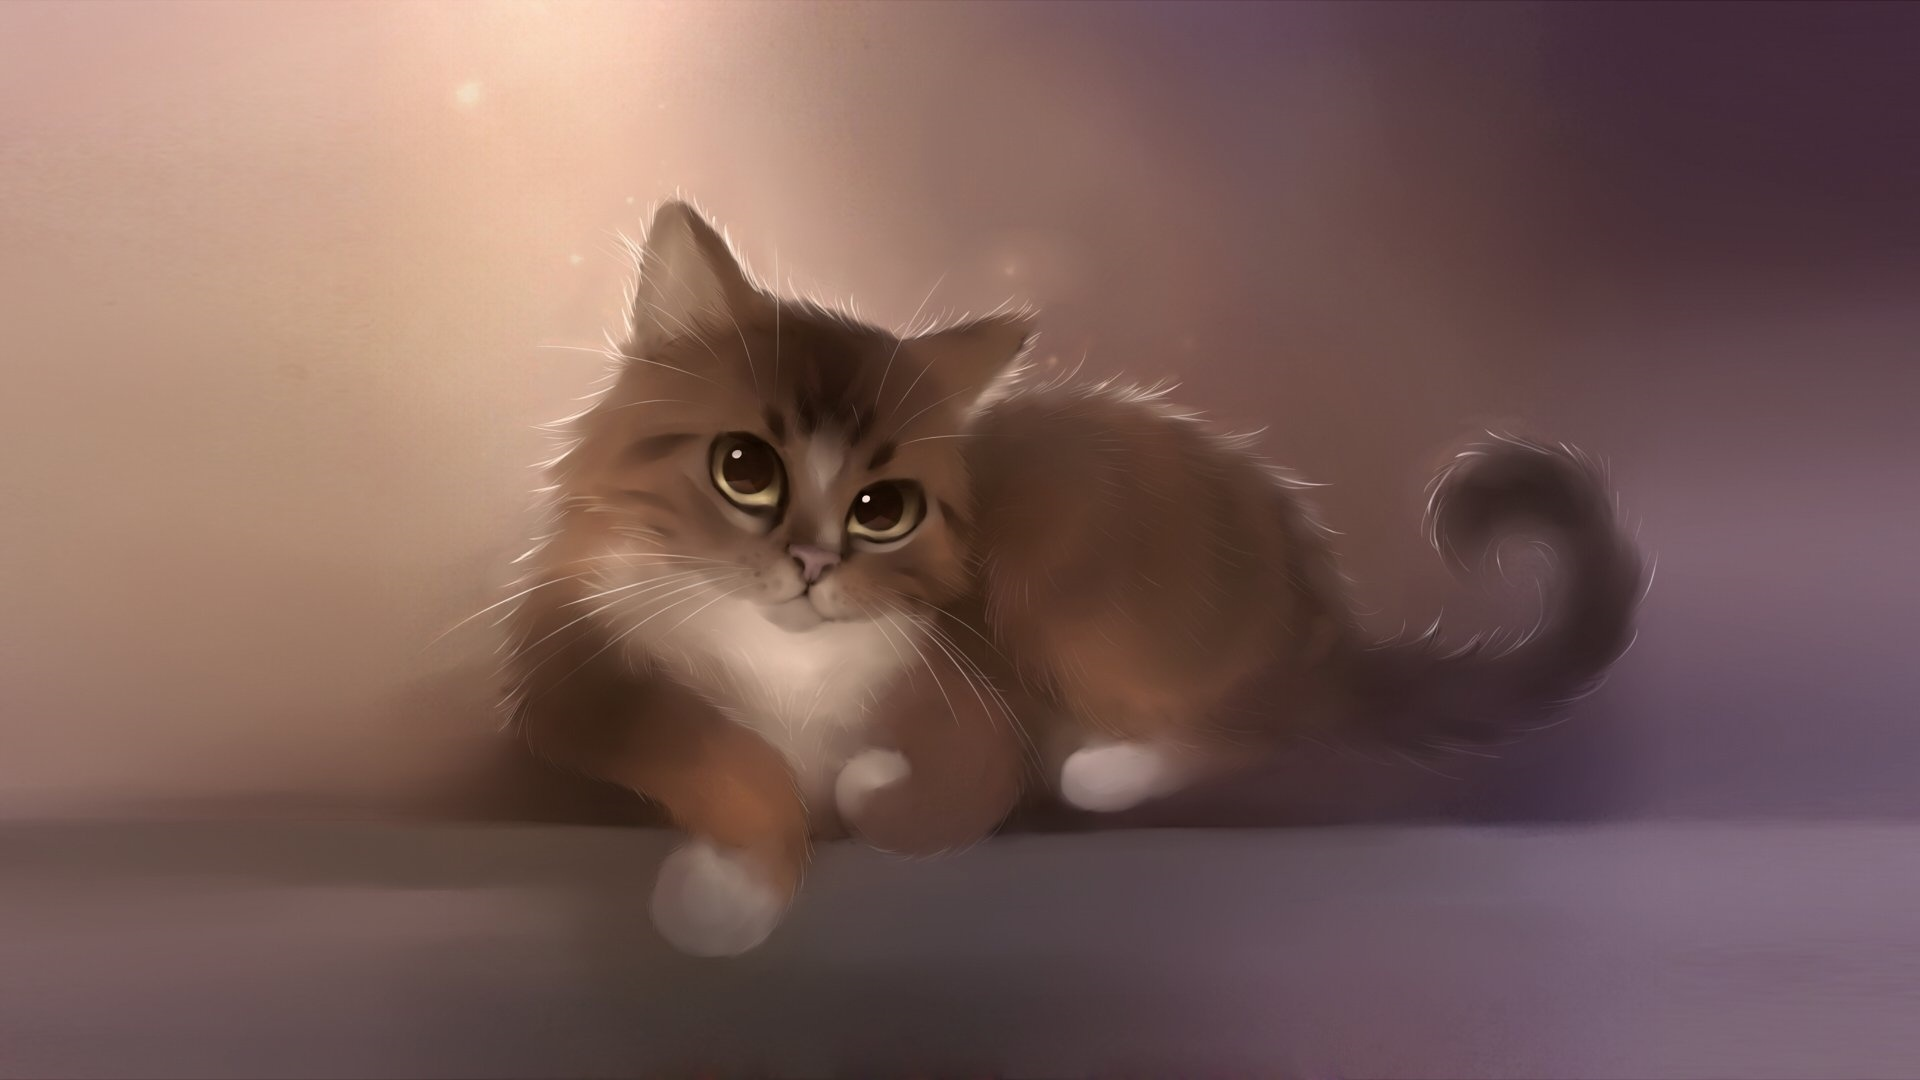 Drawn Cats Desktop Wallpaper